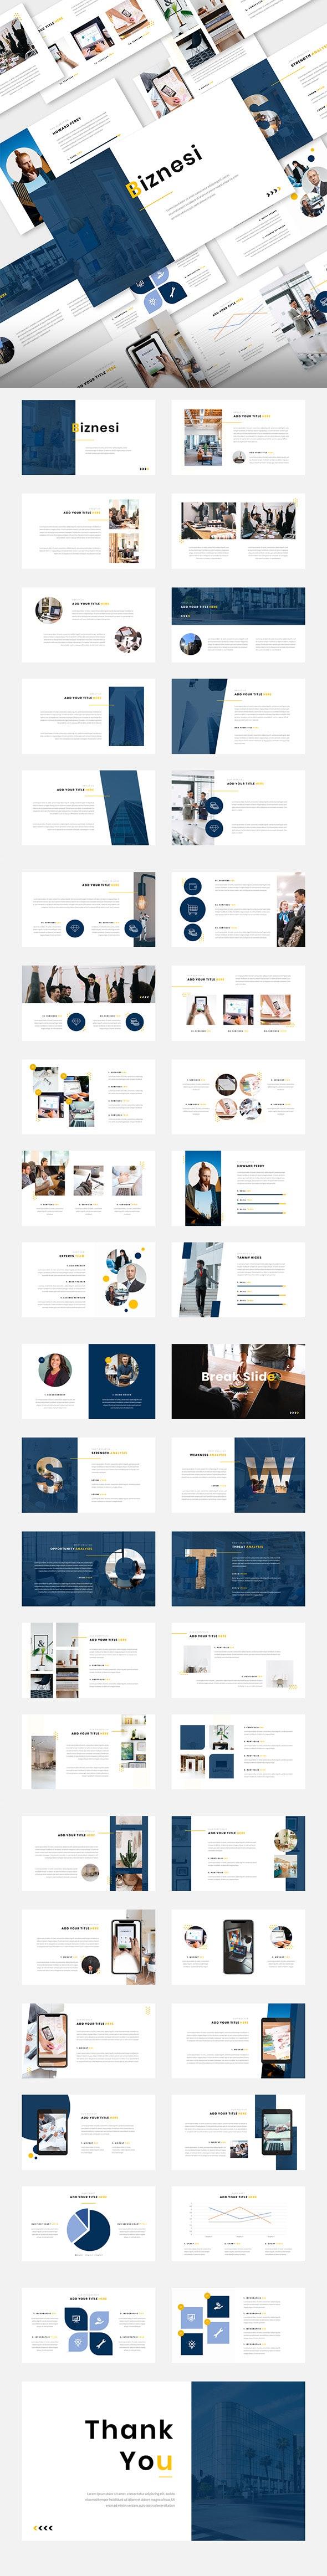 Biznesi – Business Corporate PowerPoint Template - Business PowerPoint Templates